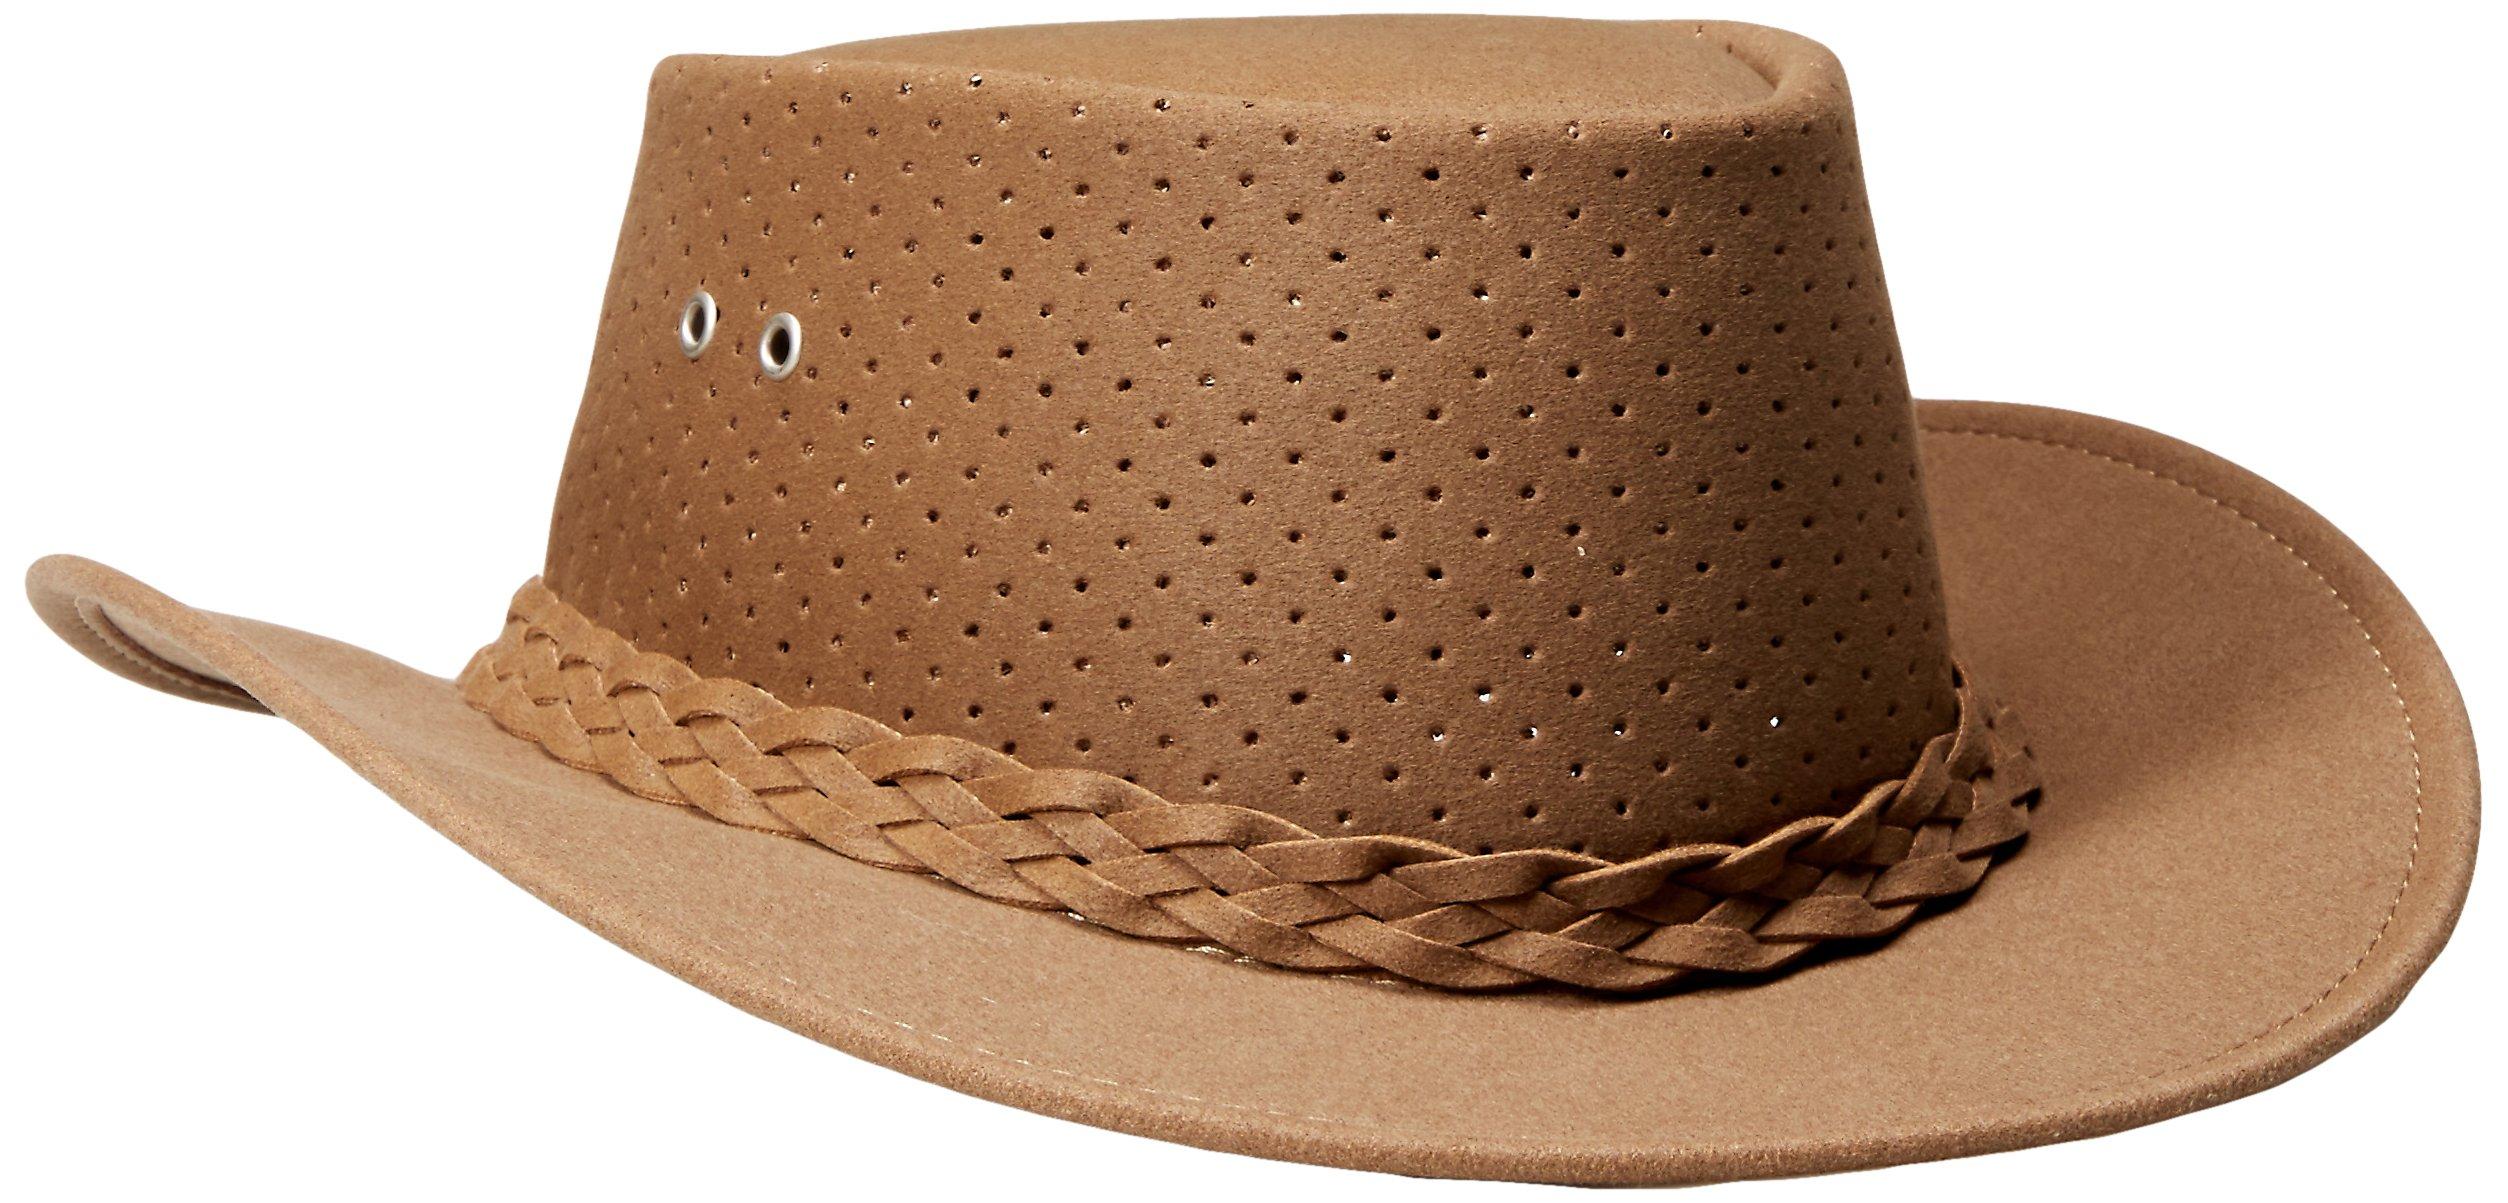 Aussie Chiller Bushie Perforated Hats Tan X-Large by Aussie Chiller